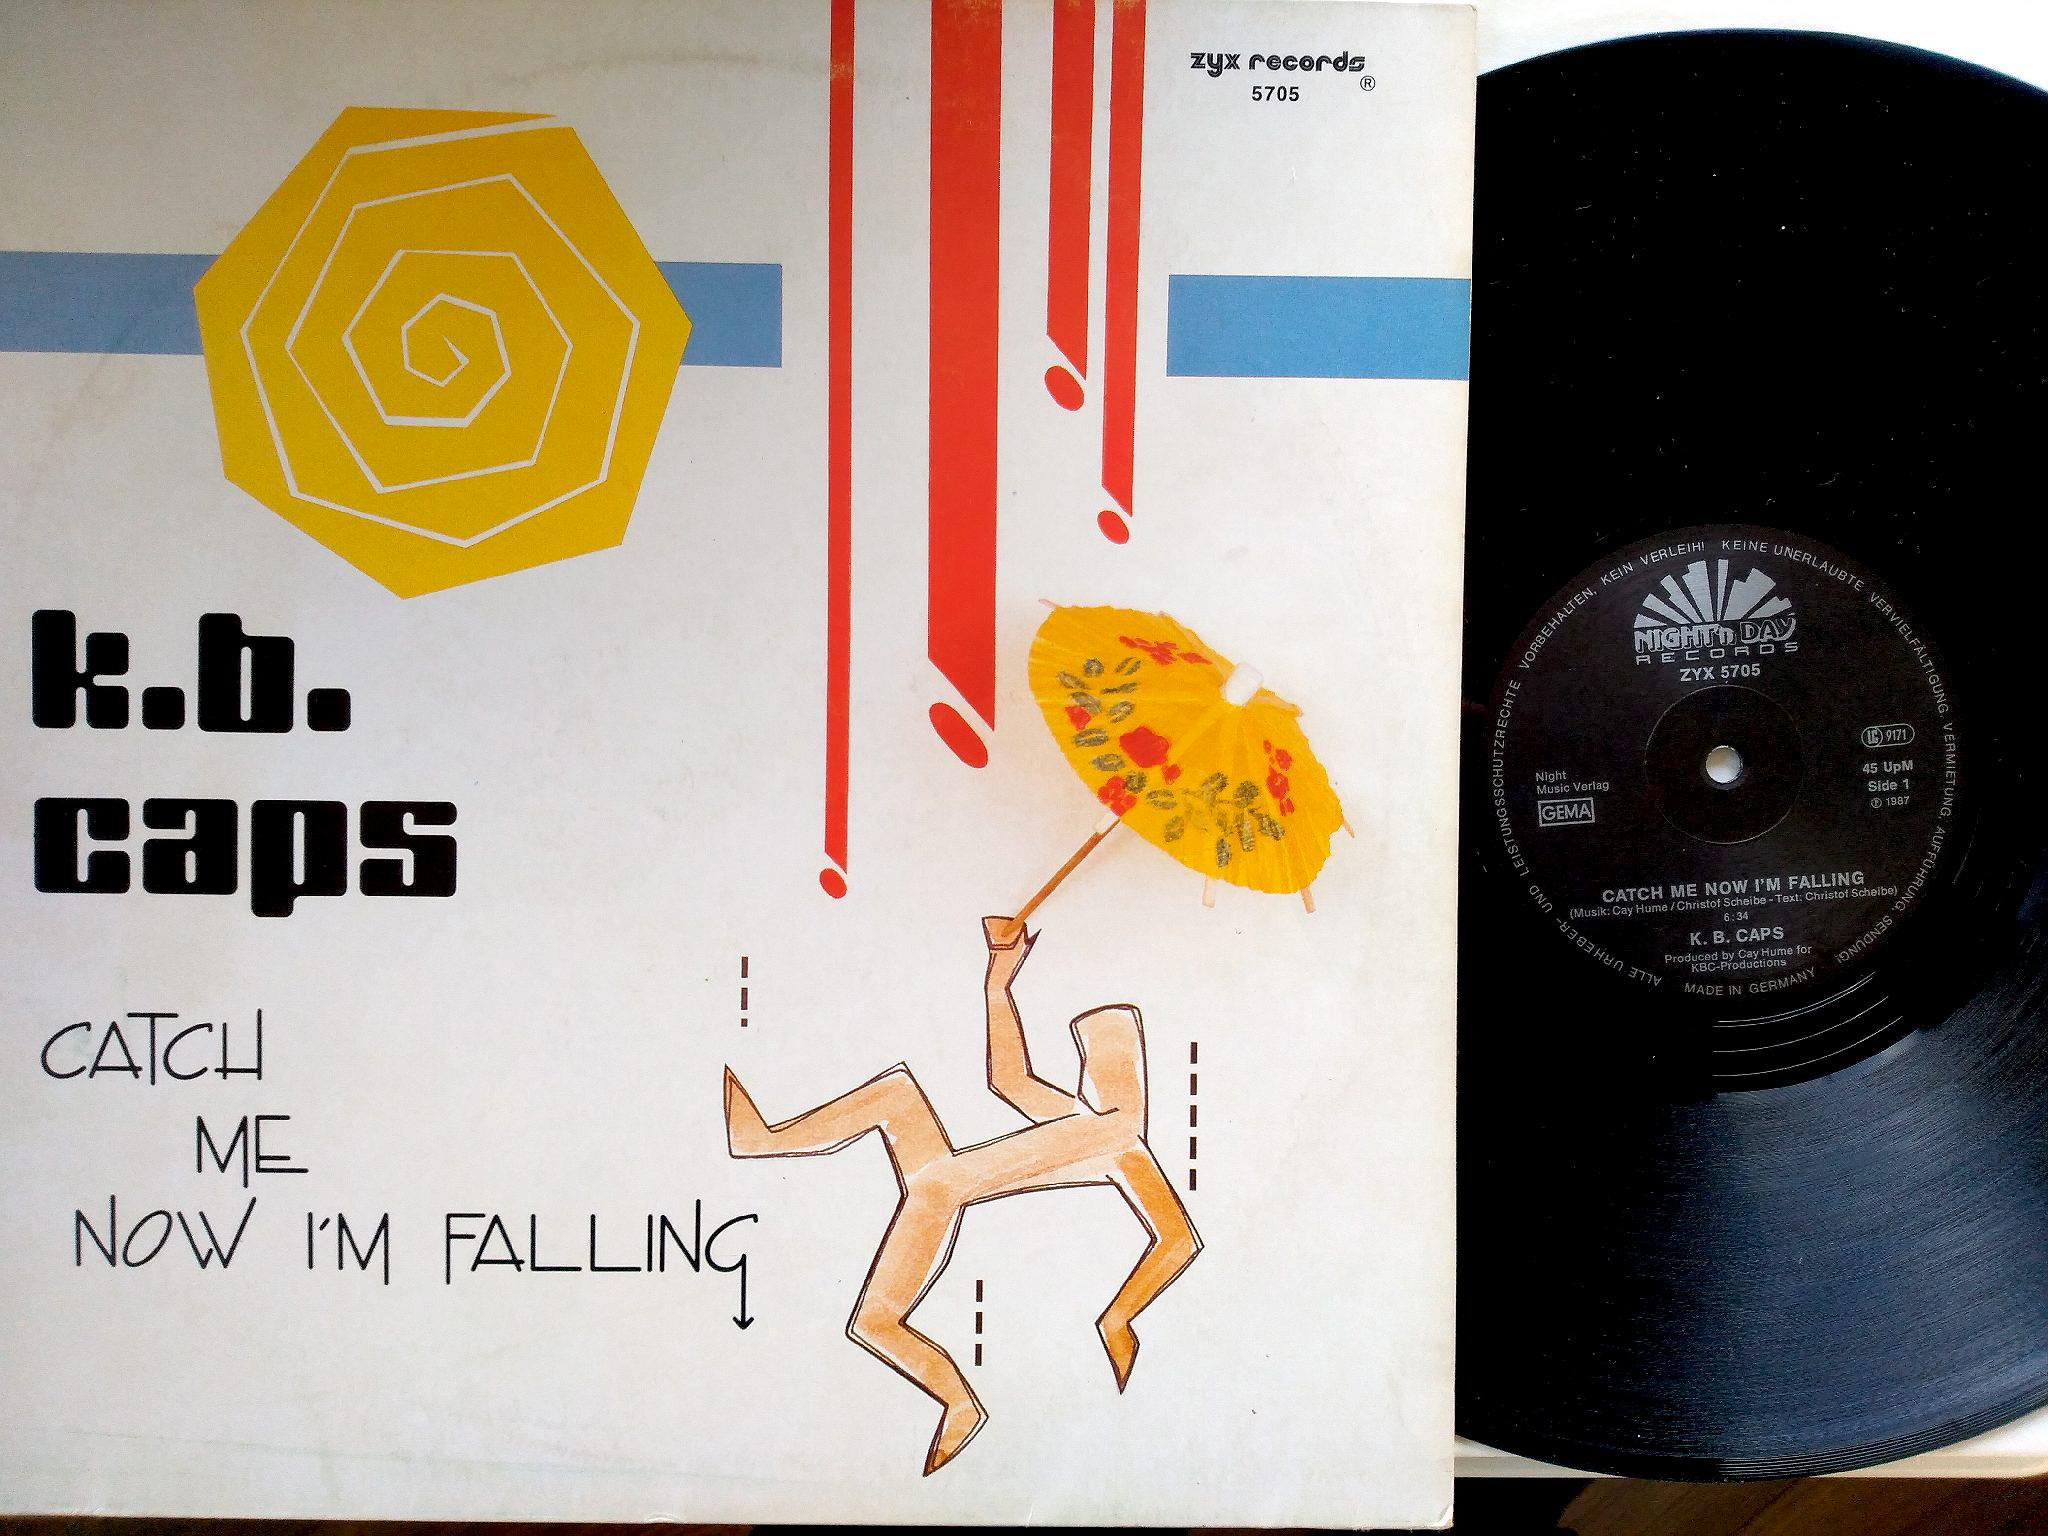 K.B. Caps - Cath Me Now i'm Falling